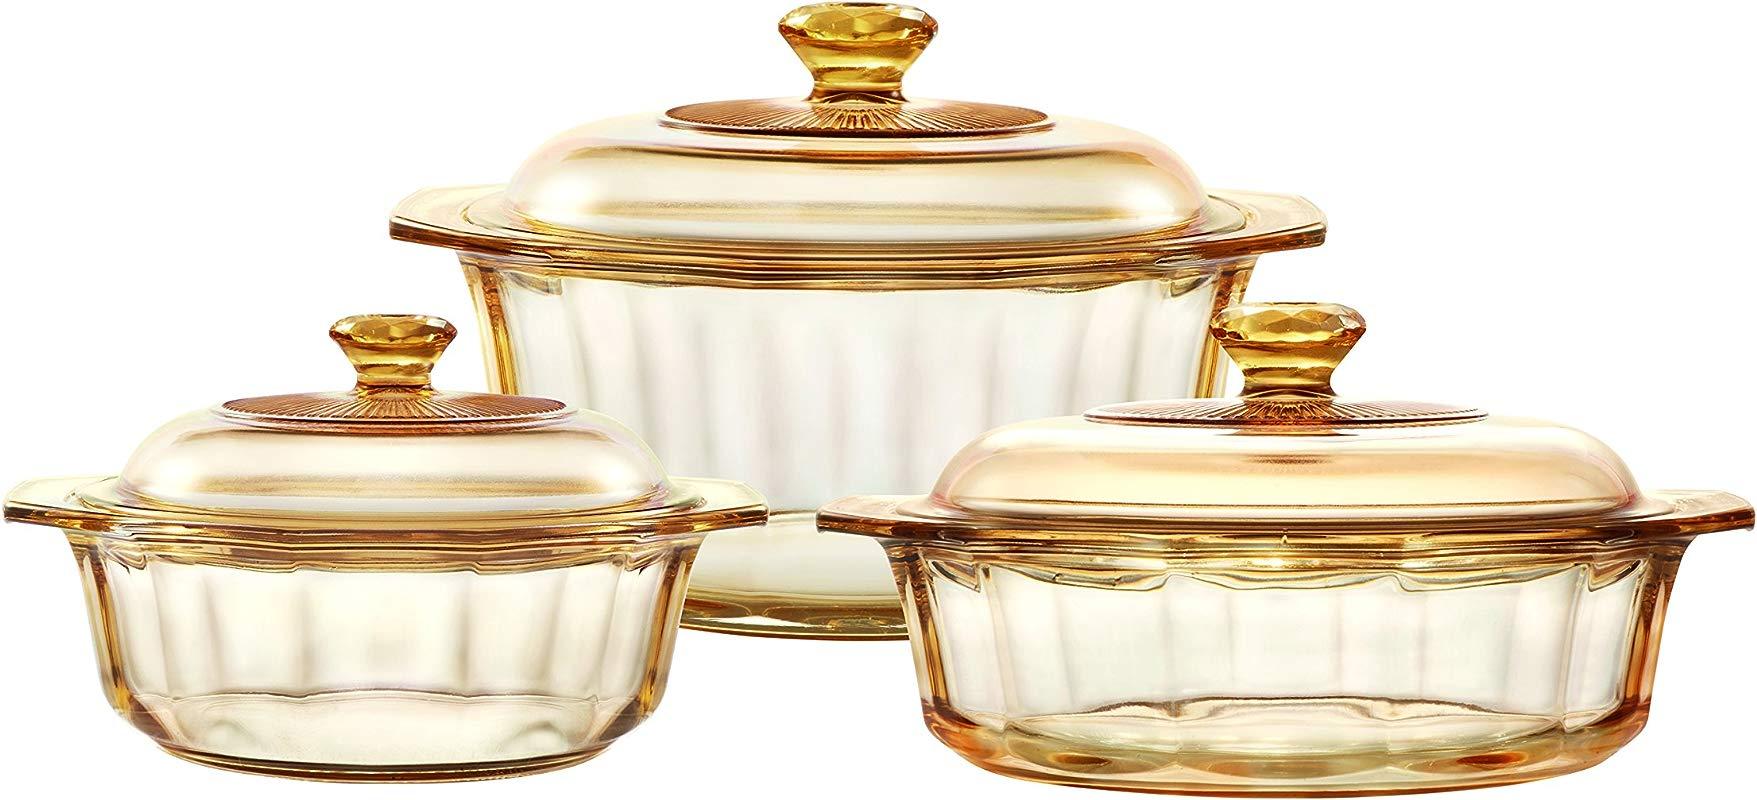 VISIONS Pyroceram Glass Diamond 6Pc Casserole And Cookpot Pot Set Brown